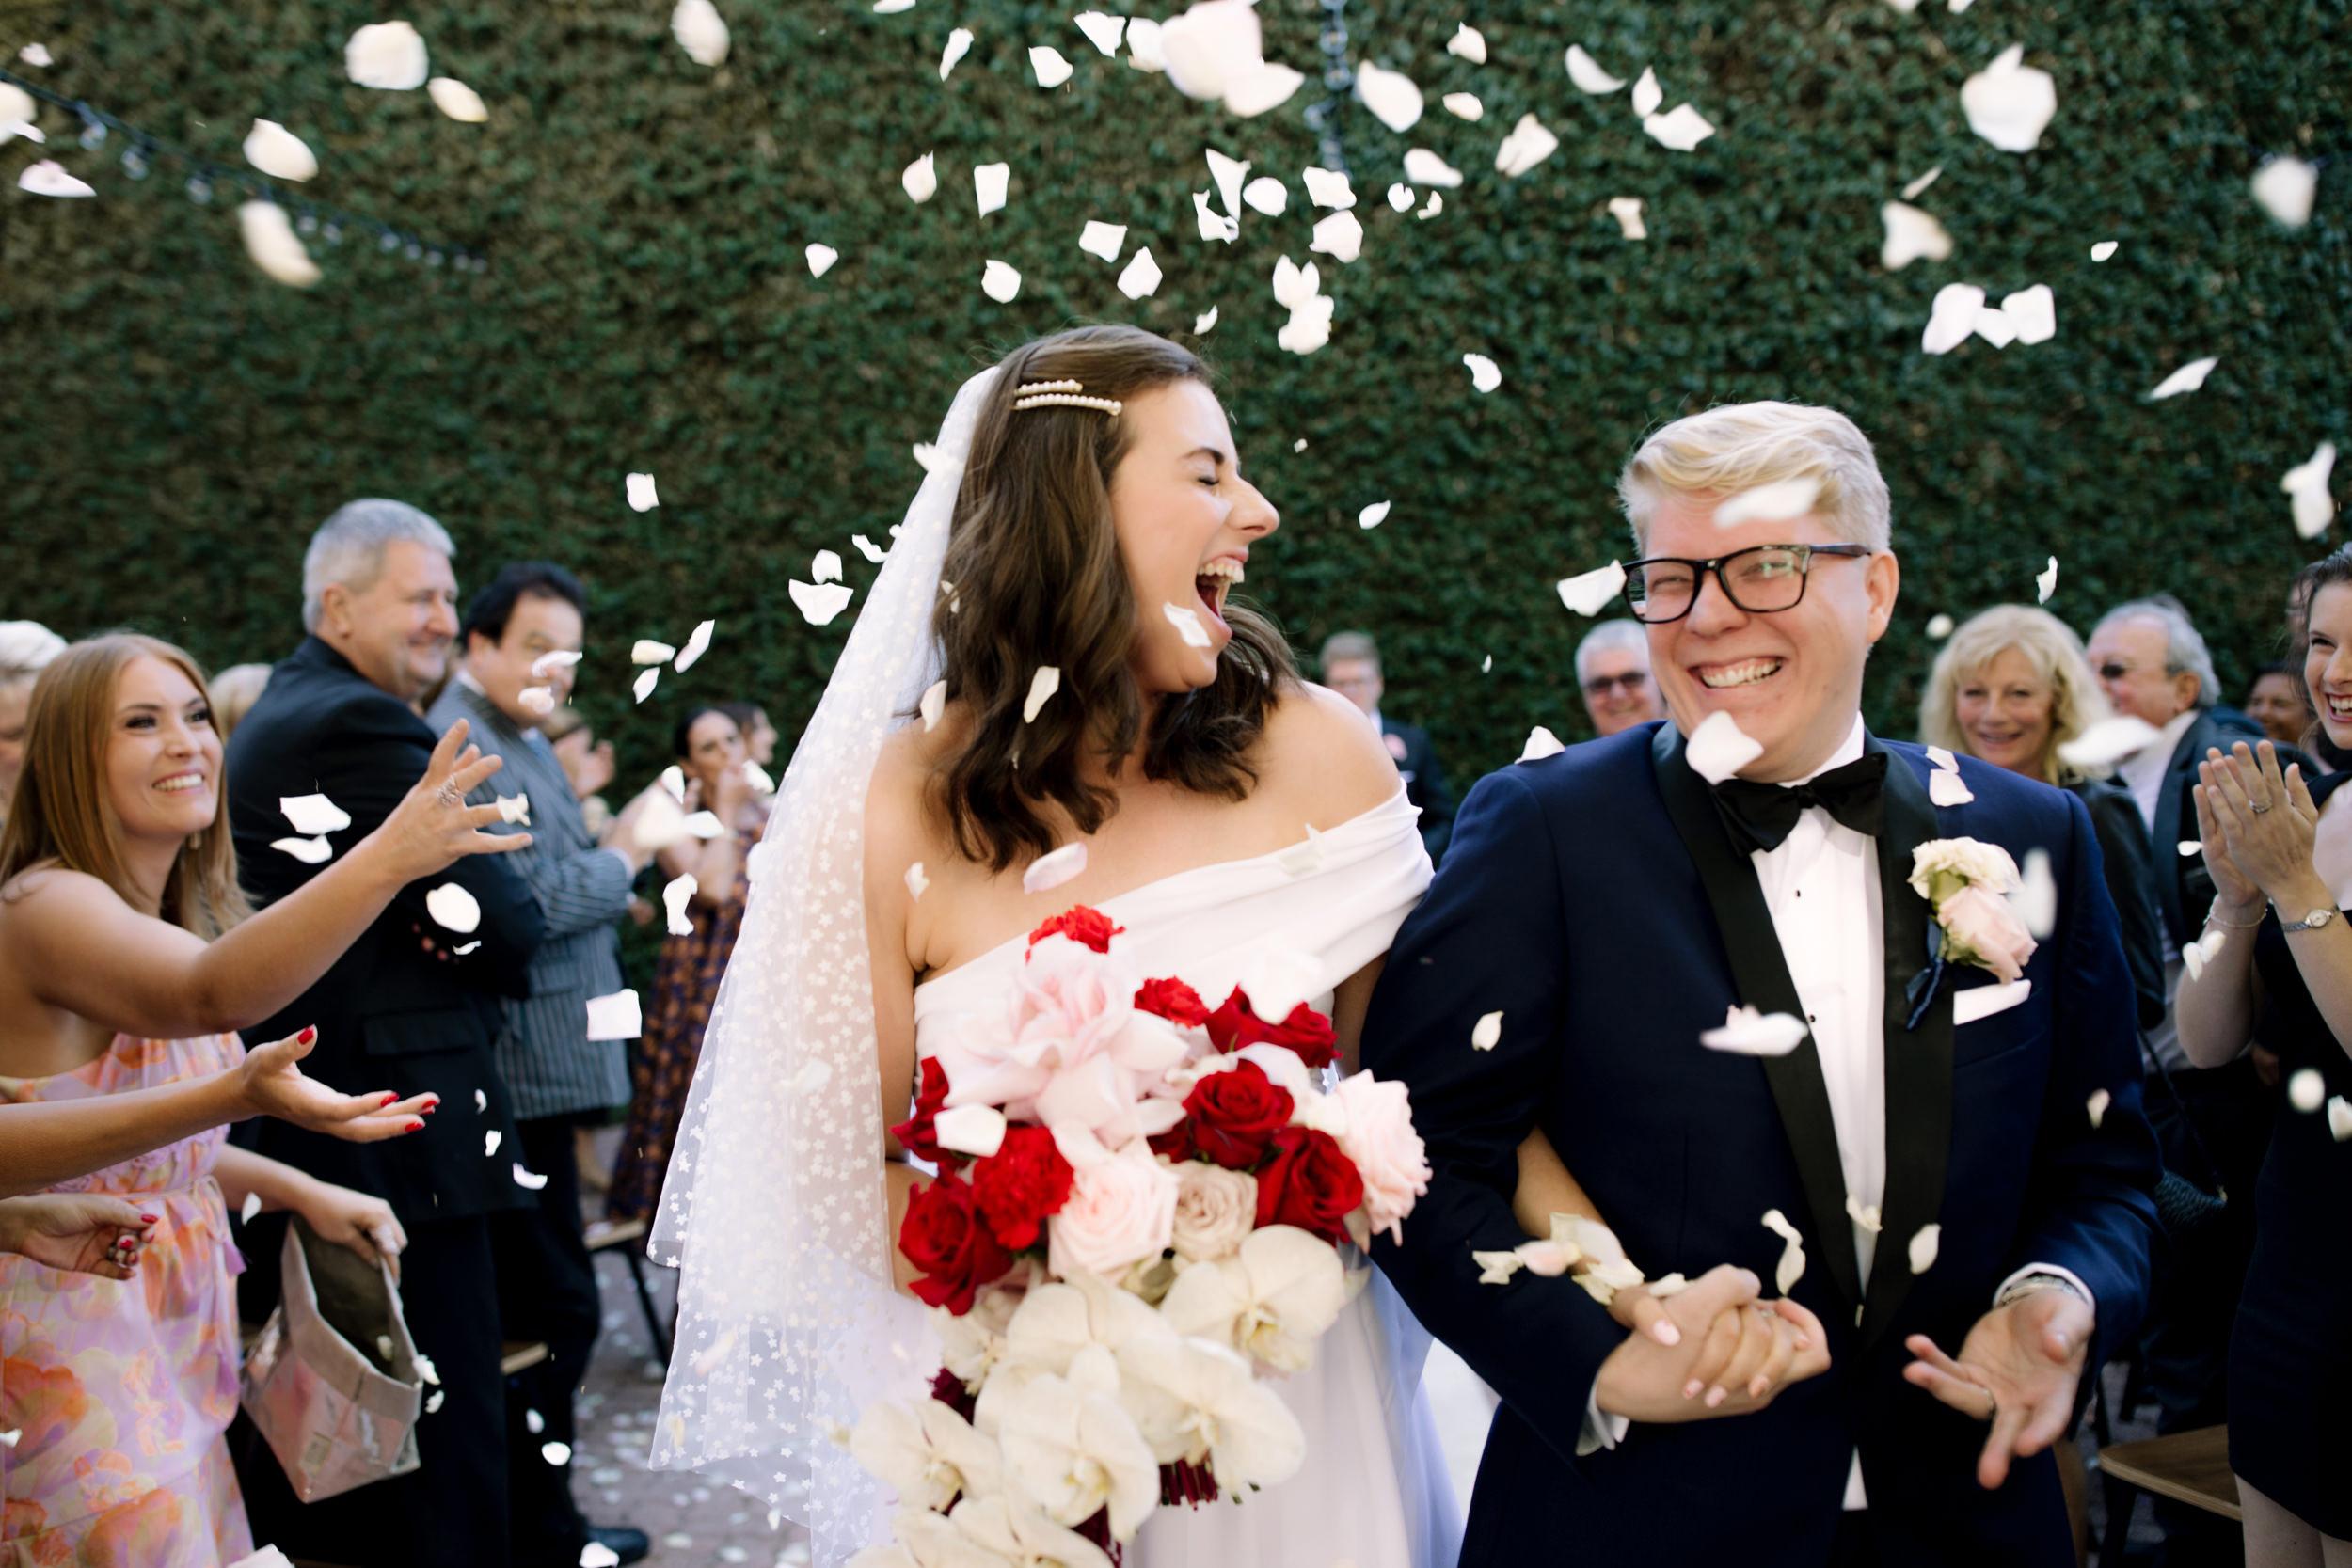 I-Got-You-Babe-Weddings-Tahlia&Mitch-Butler-Lane-Wedding0117.JPG